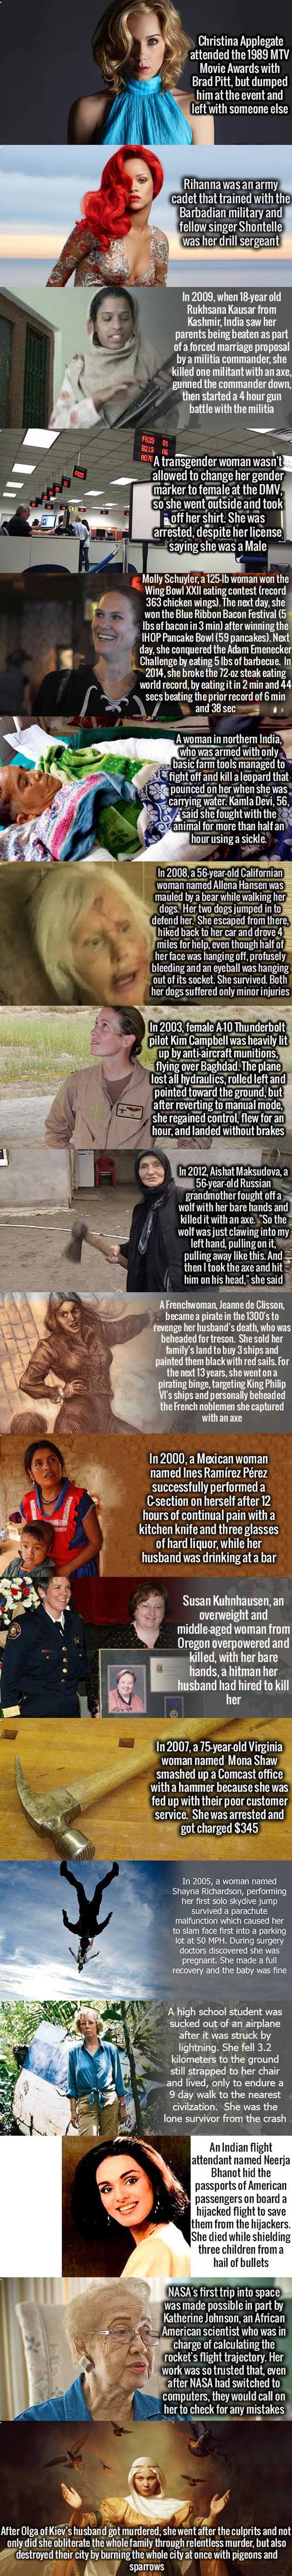 woman-made-incredible-things